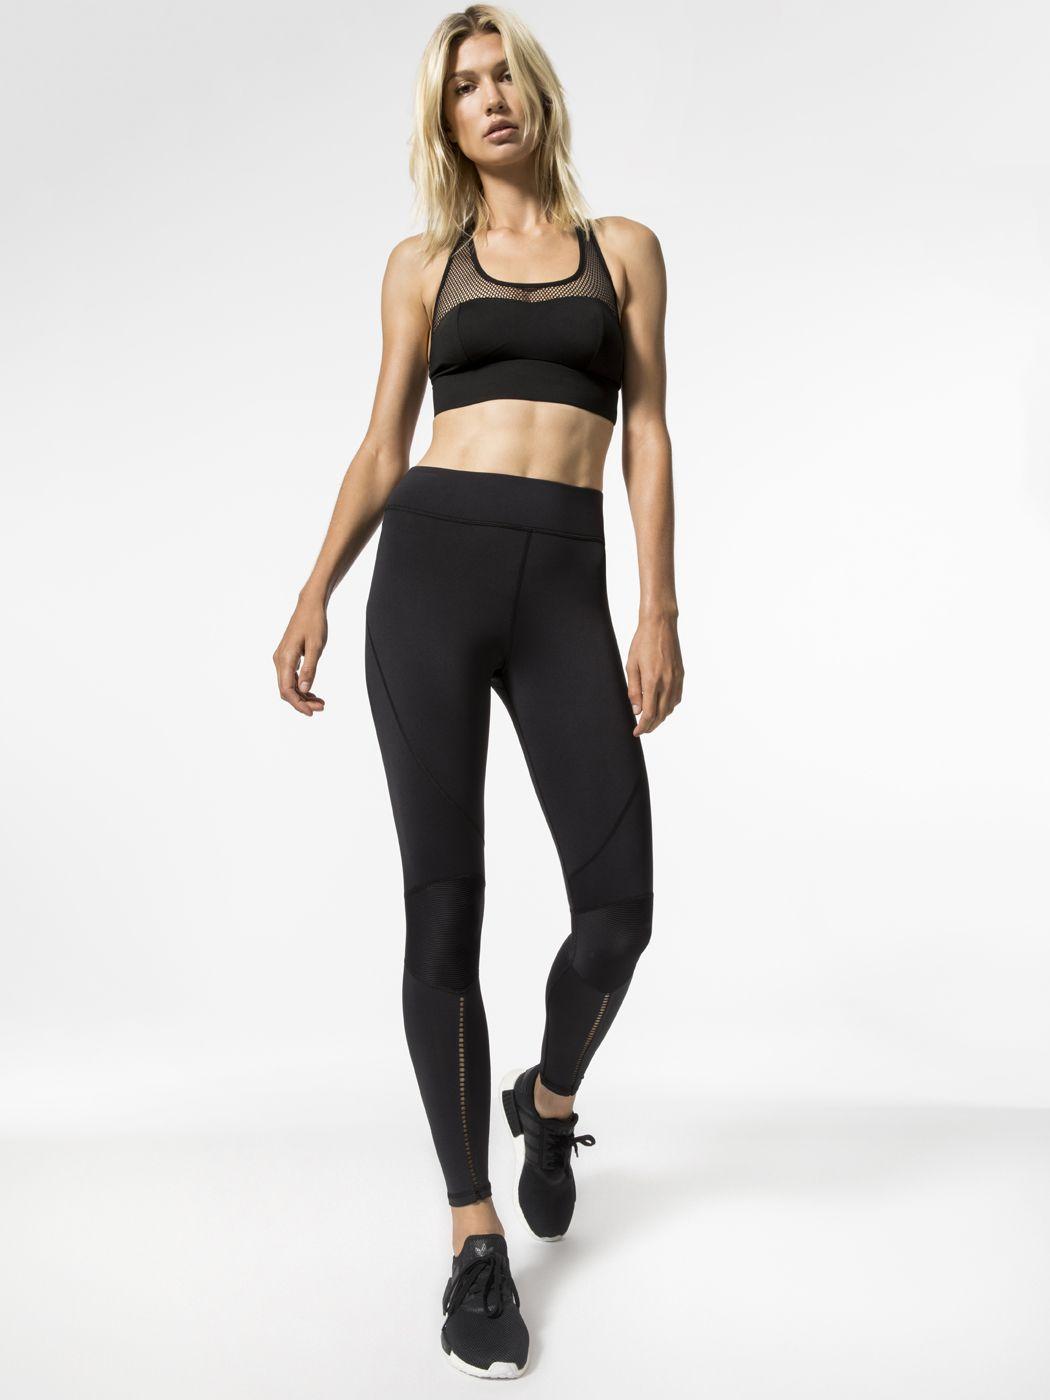 Zero Gravity Medium Support Sport Bra in Black Black